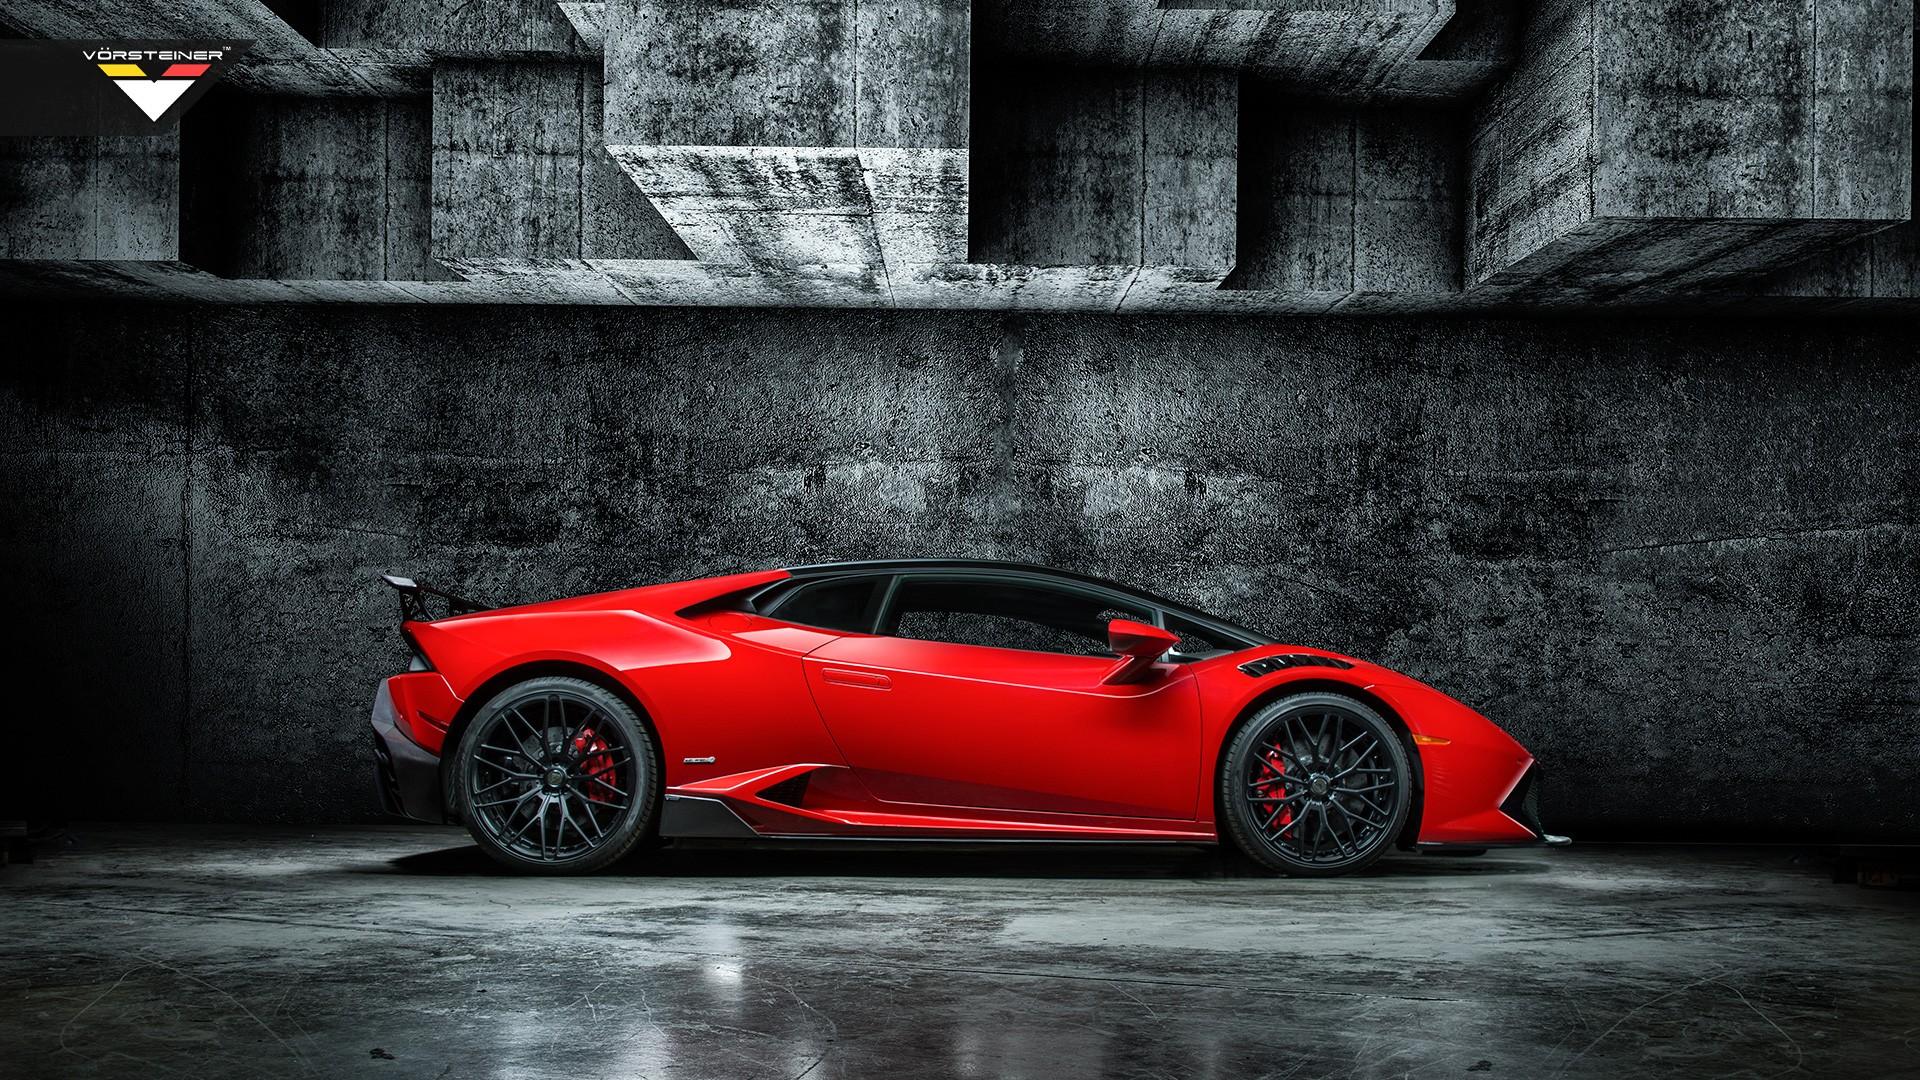 Wallpaper Ferrari Iphone 5 2016 Rosso Mars Novara Edizione Lamborghini Huracan 4